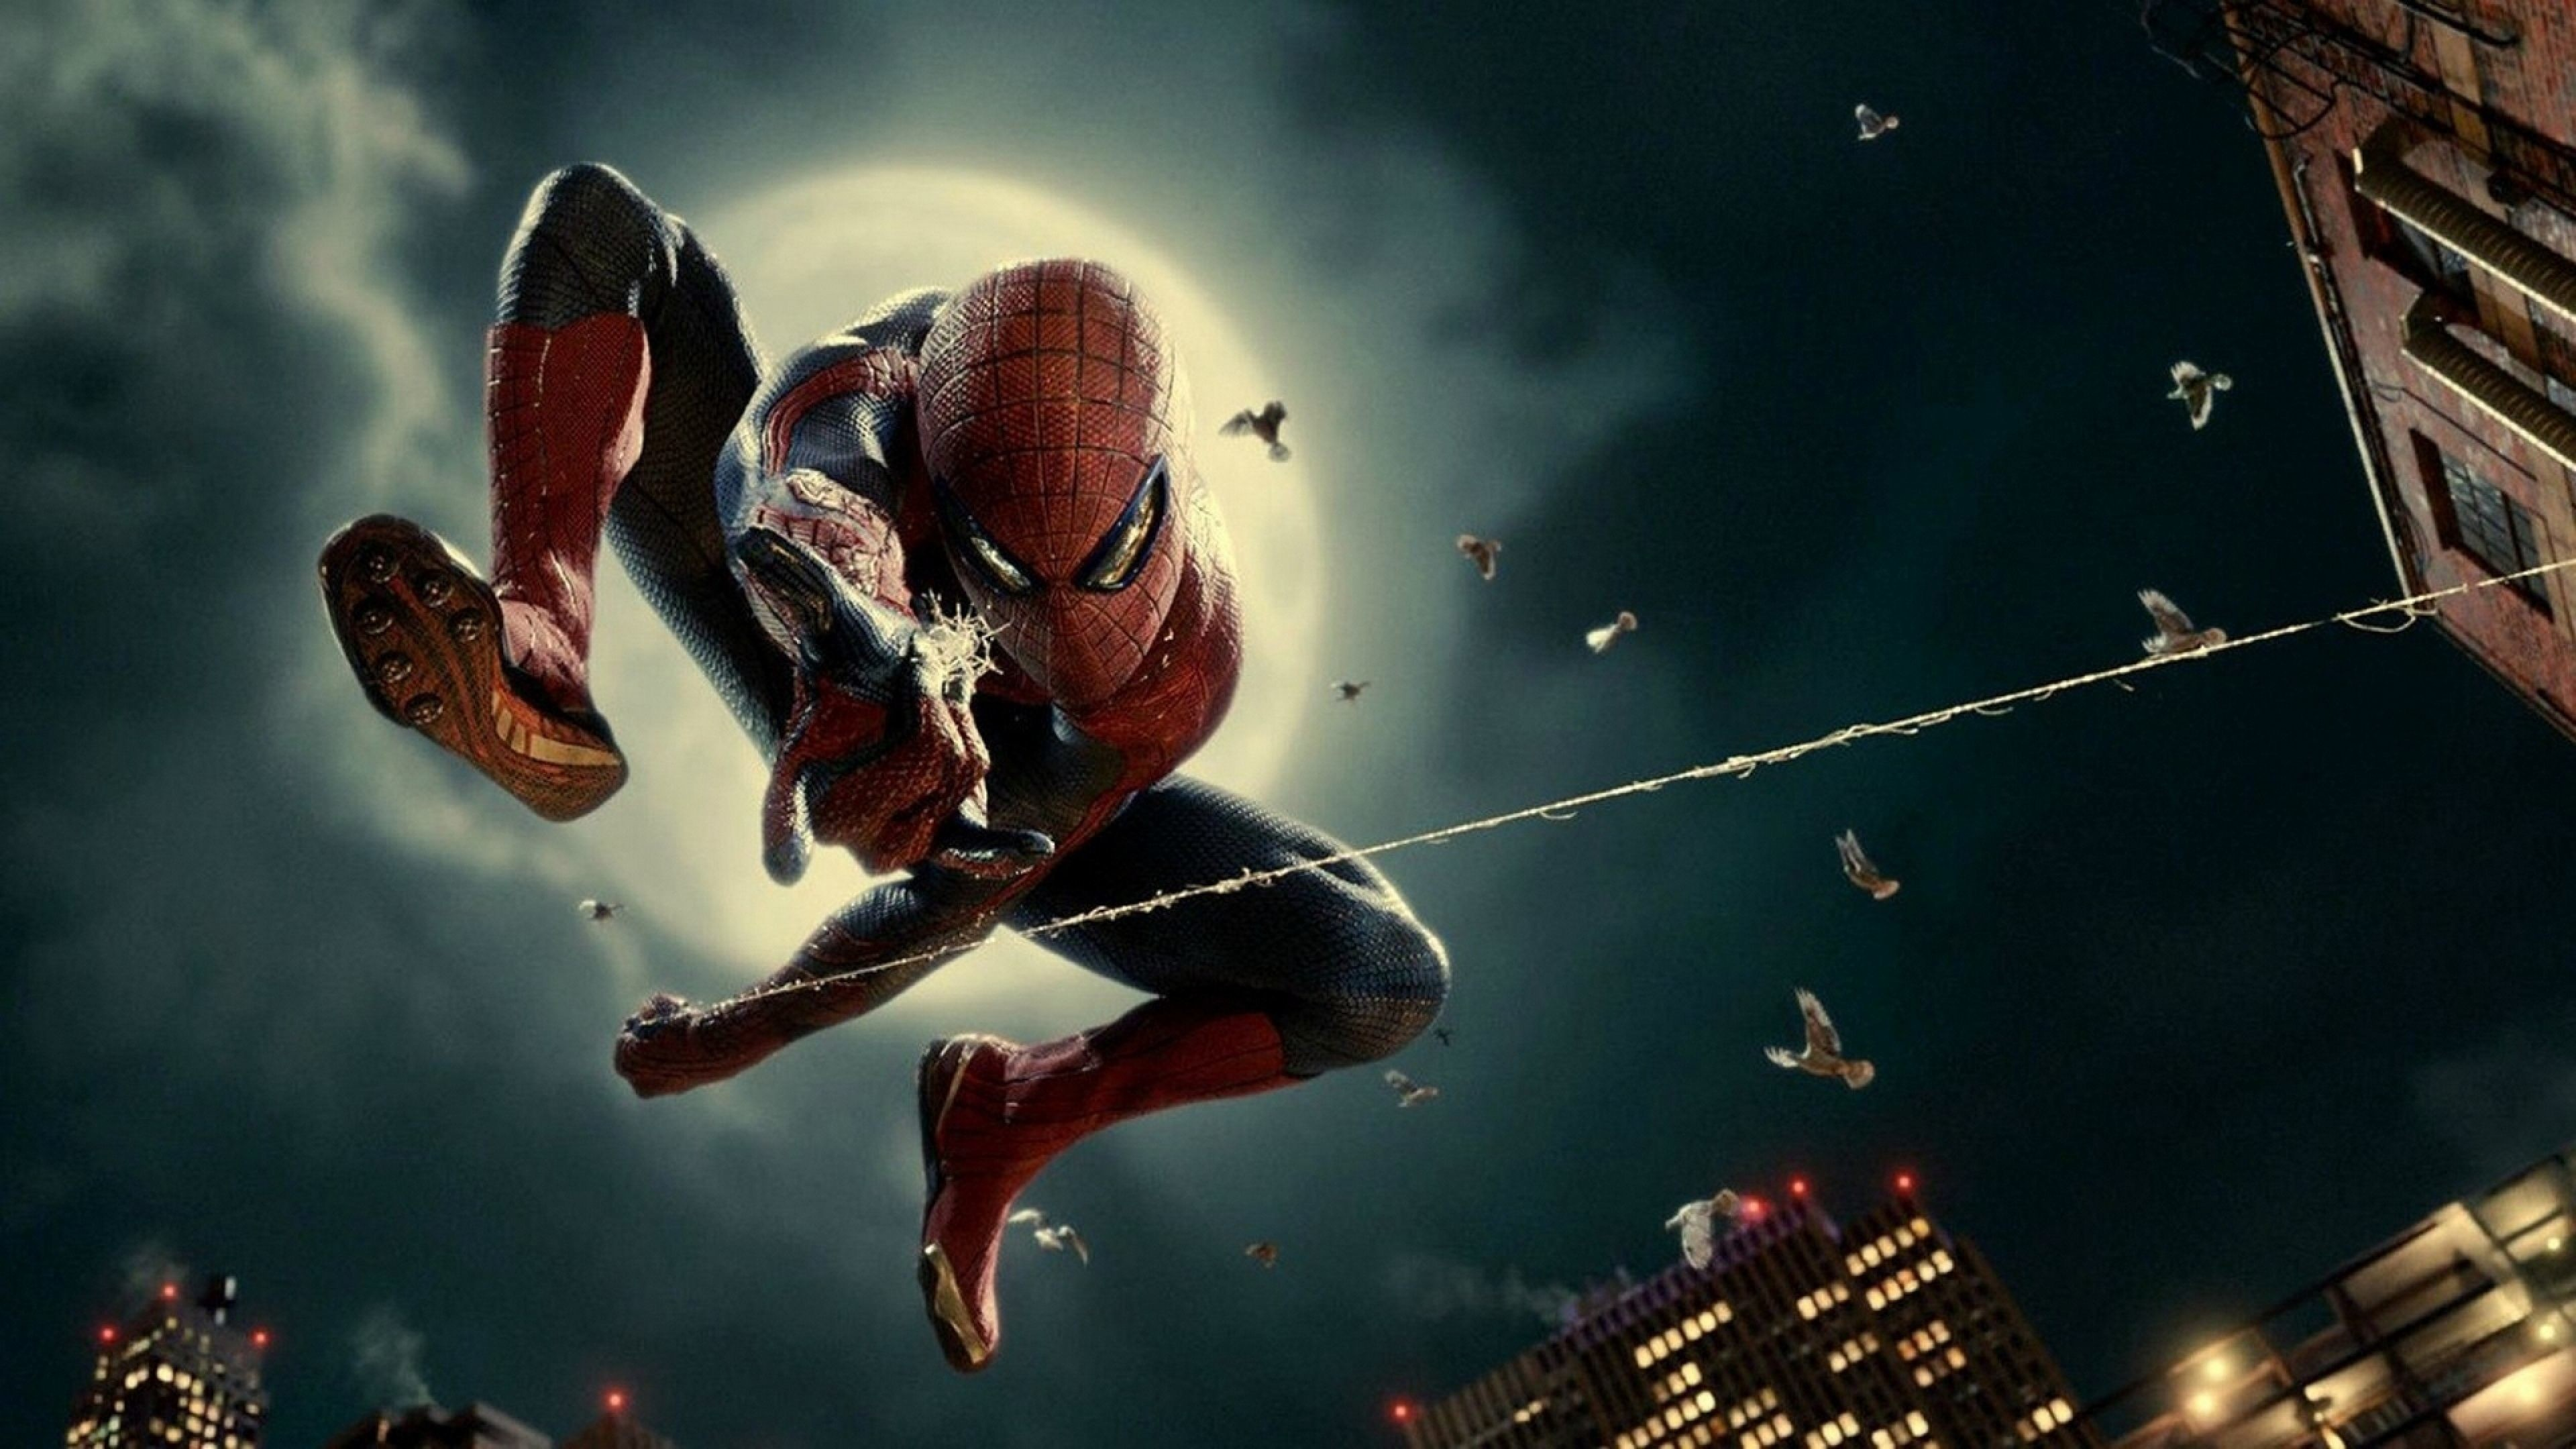 Spiderman Logo Background Wallpaper HD For Desktop